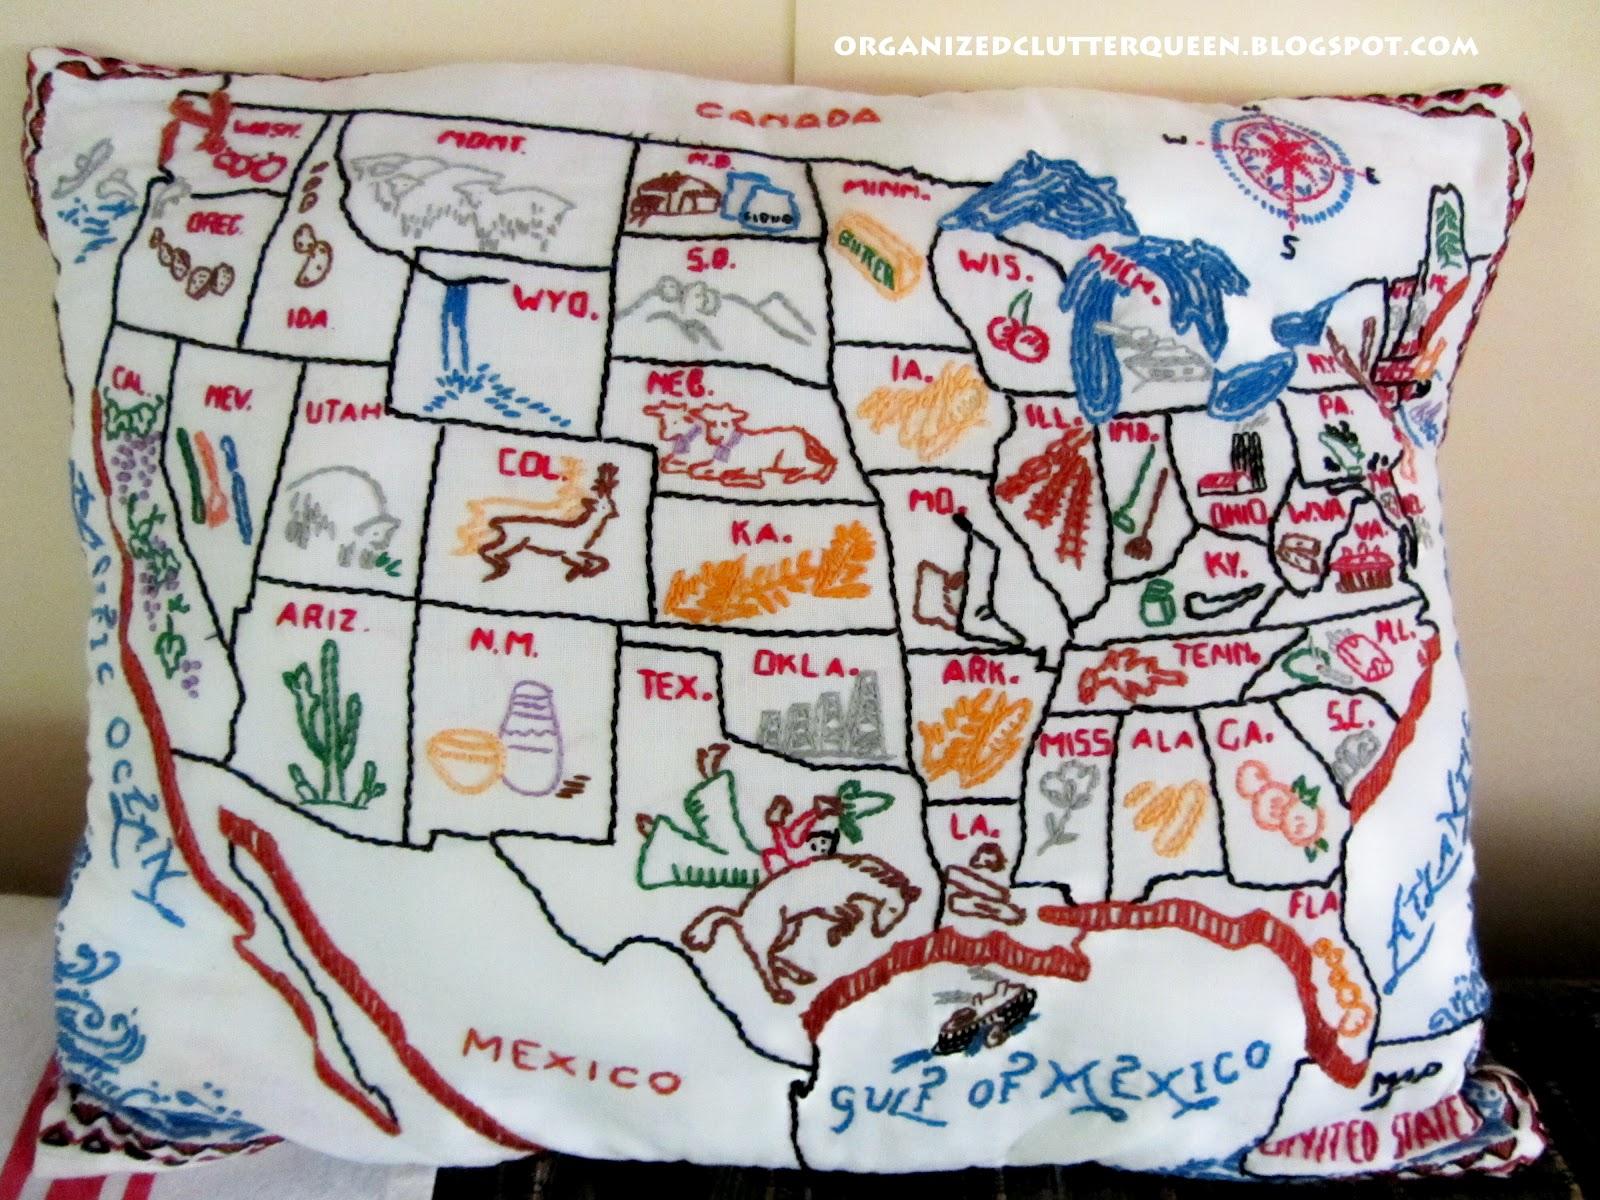 Vintage USA Map Pillow Organized Clutter